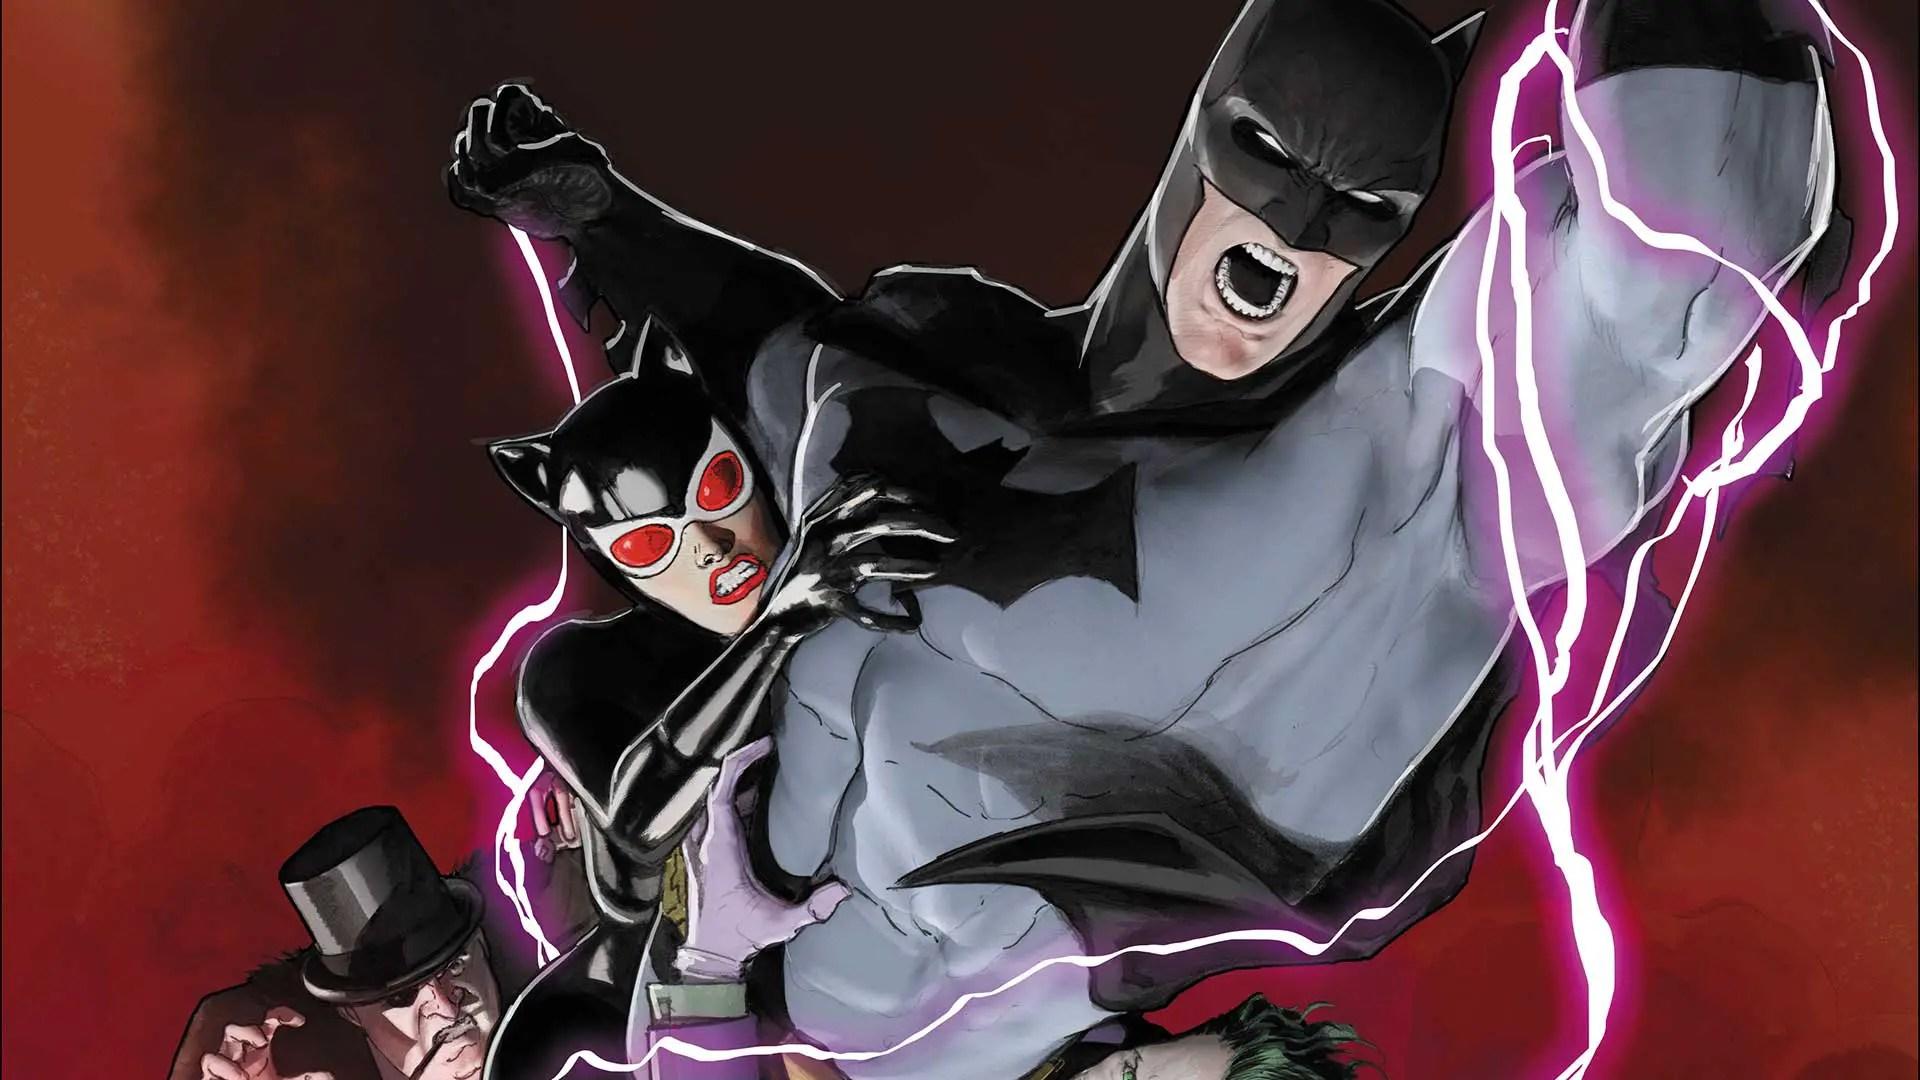 Batman #66 Review: Questionable storytelling